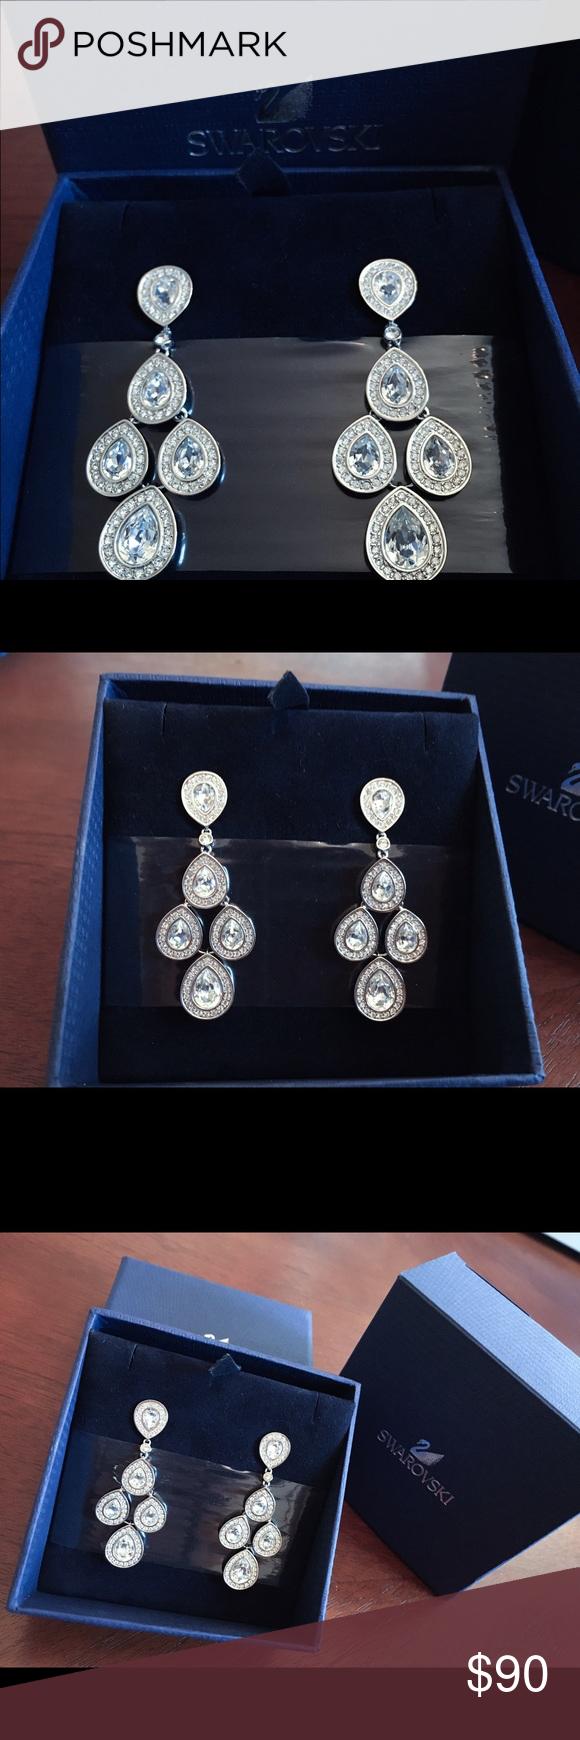 9c78718cc BNIB Swarovski Sensation Pierced Earrings 1156254 Brand new, unworn pair of  genuine Swarovski Sensation pierced